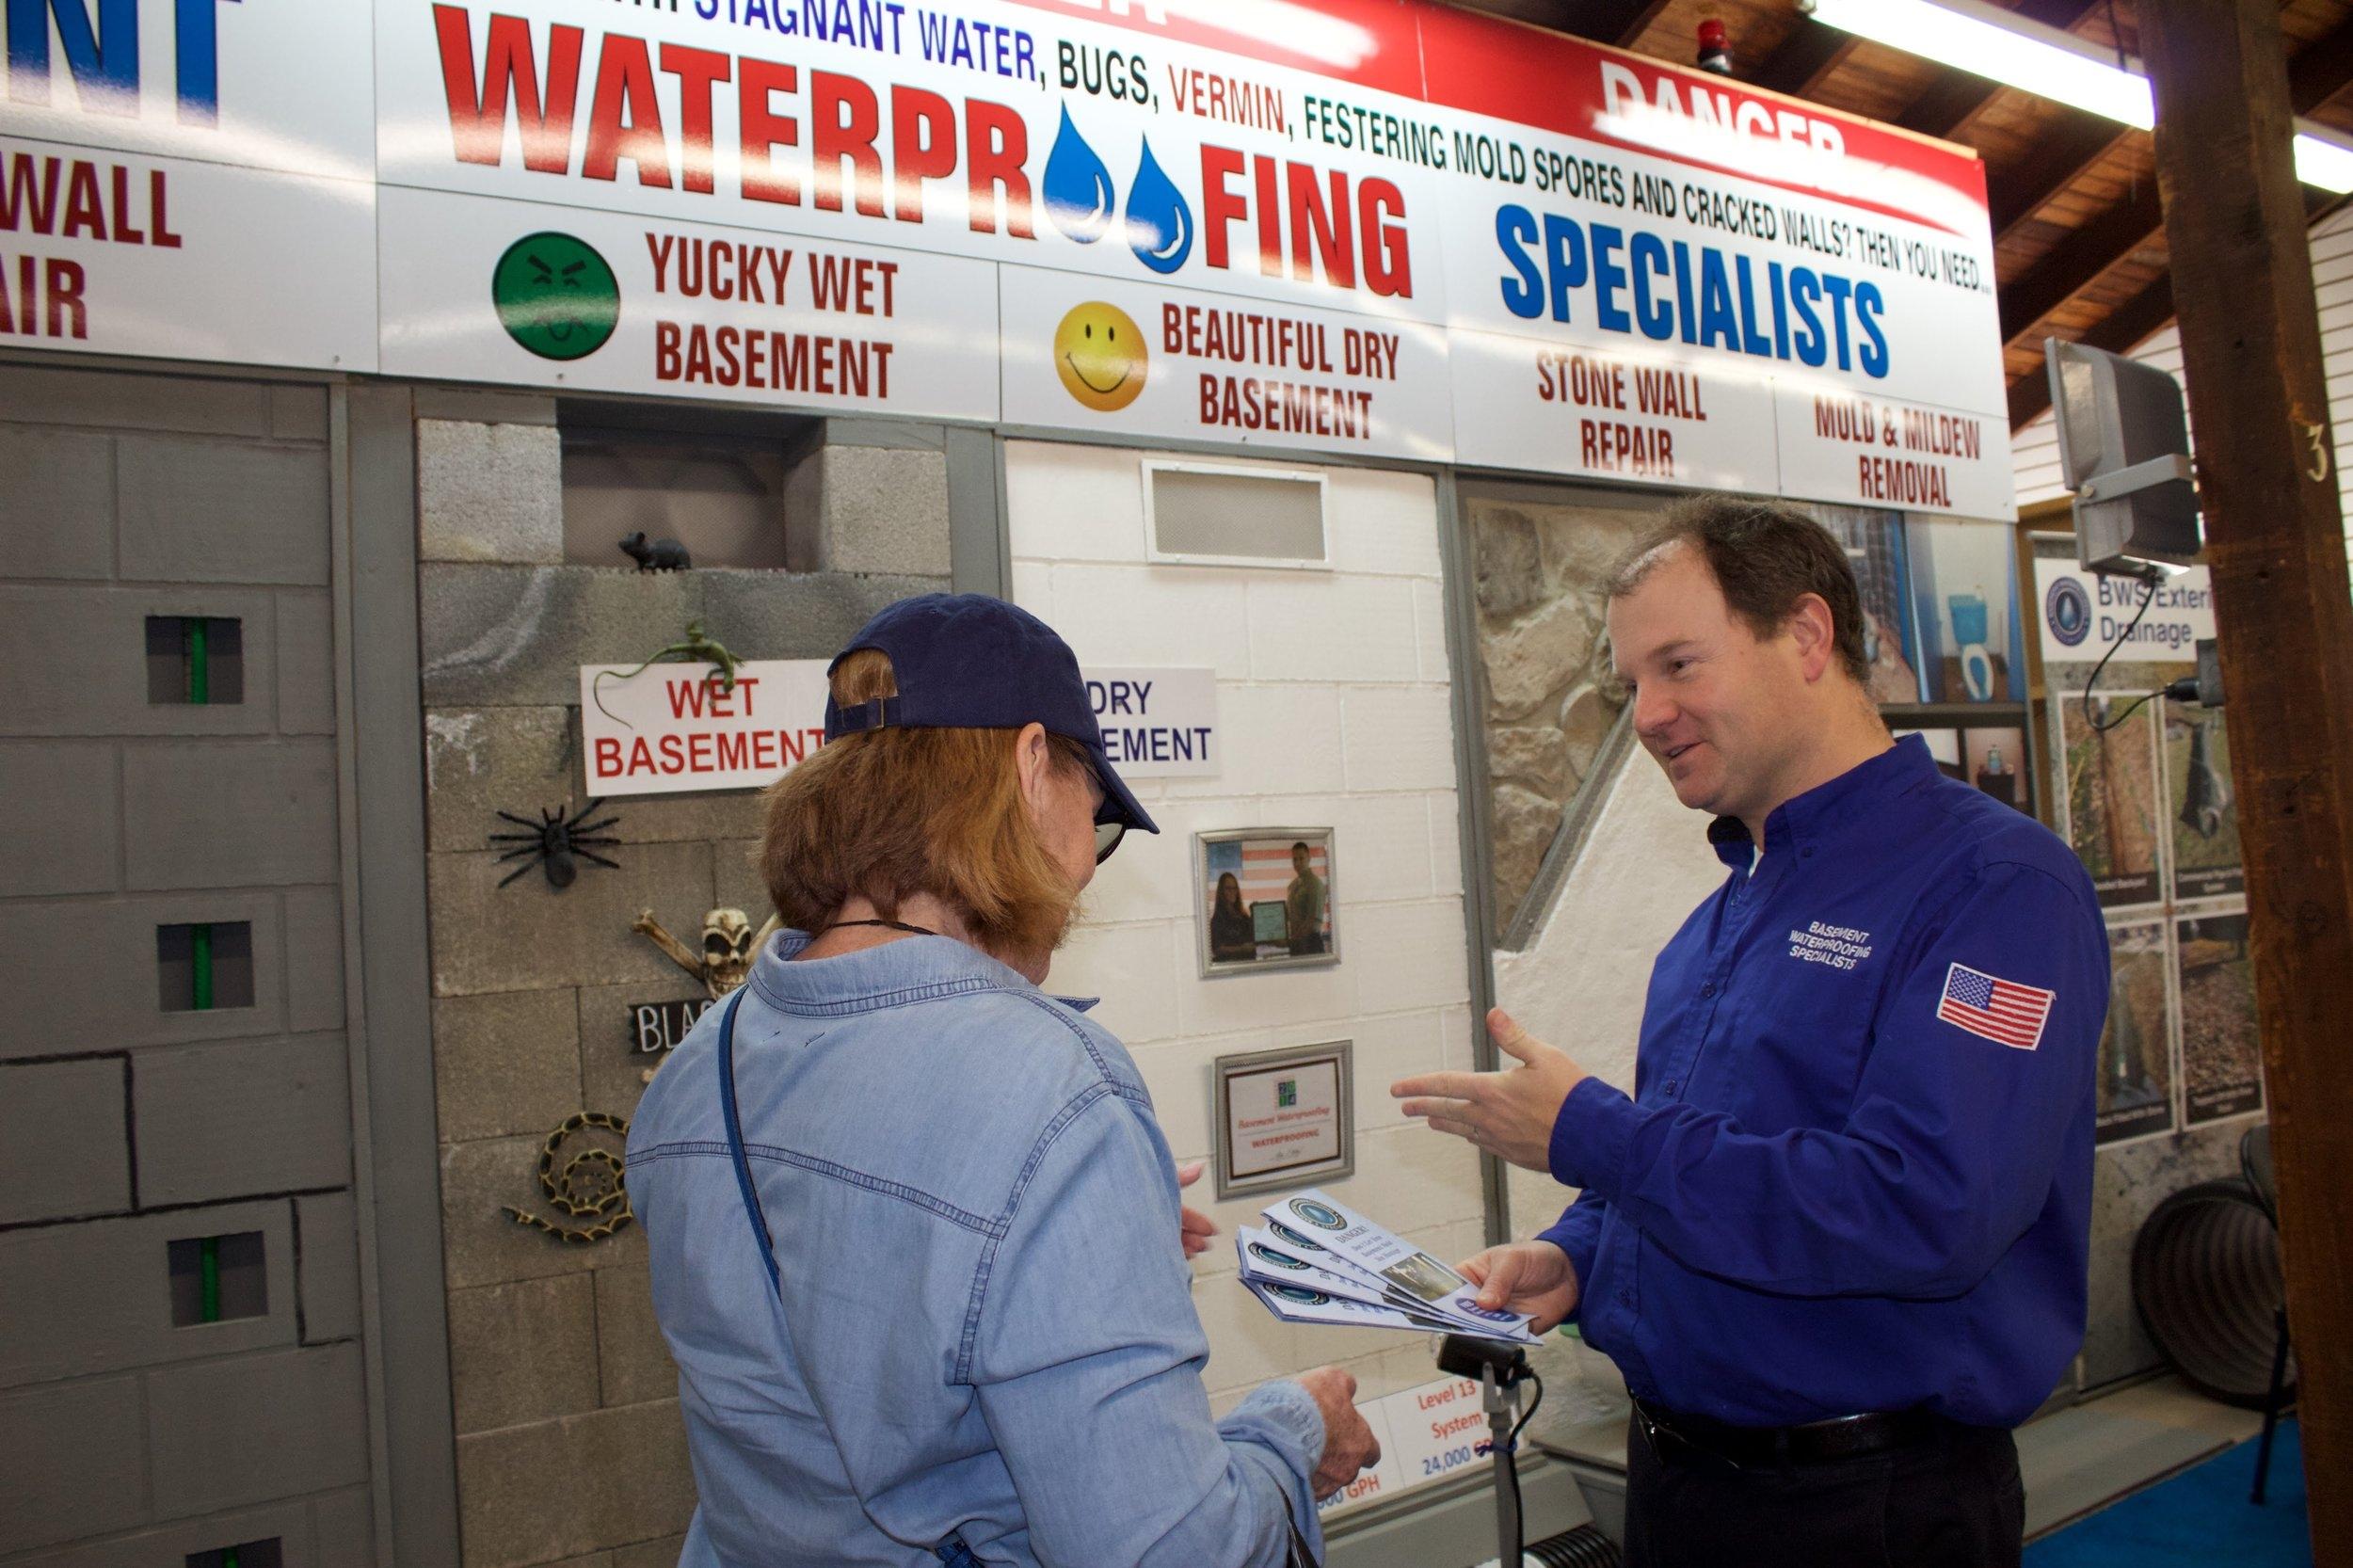 Basement Waterproofing Specialists.jpg